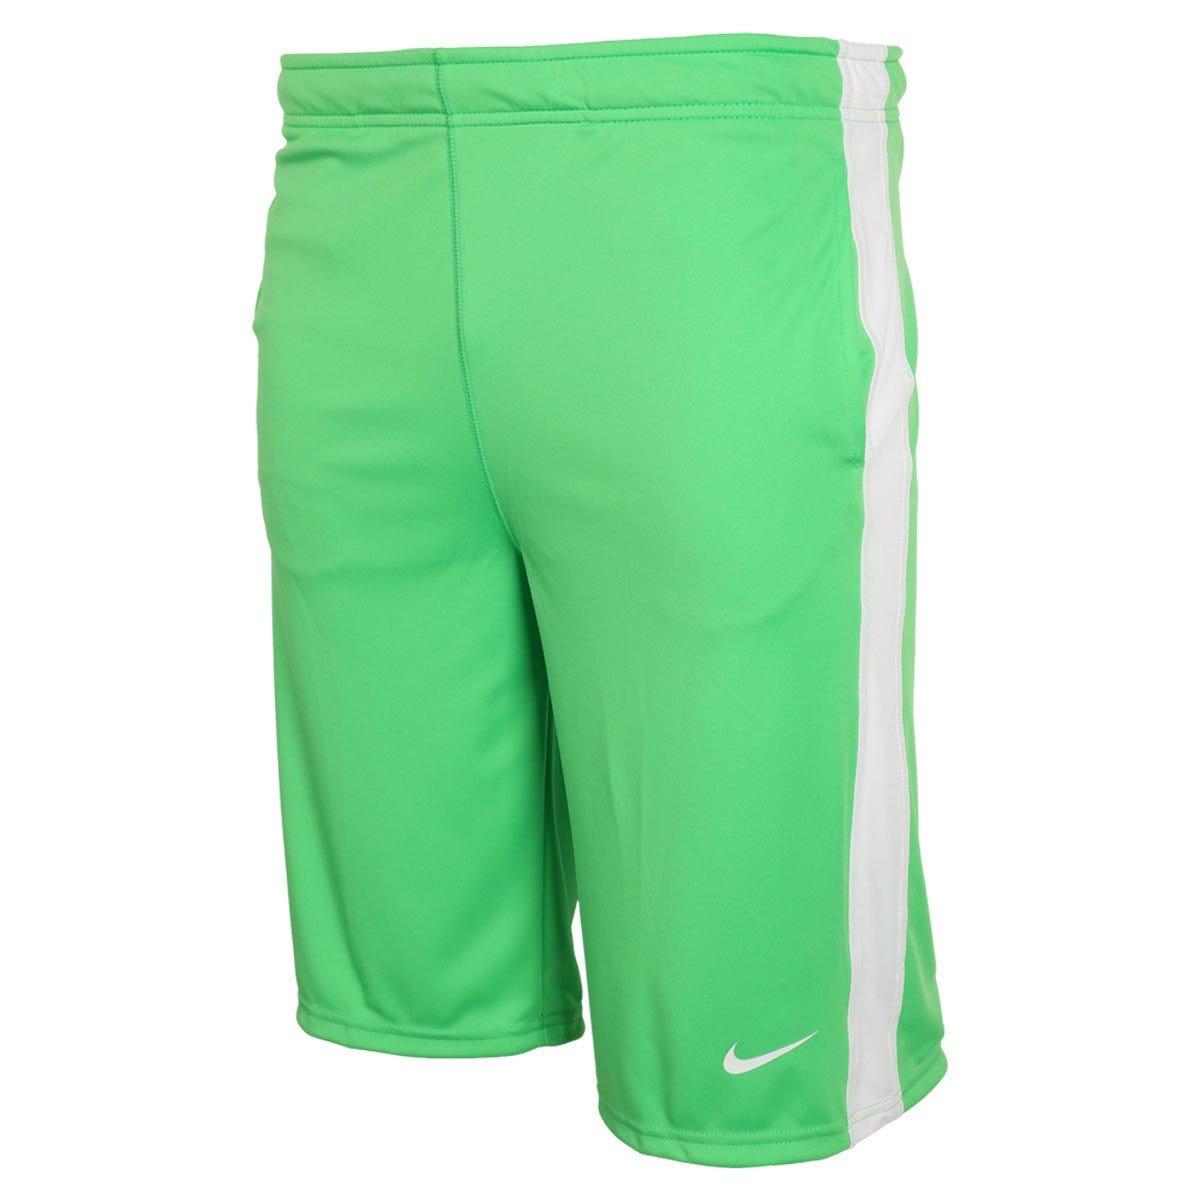 Nike Fly Youth Short